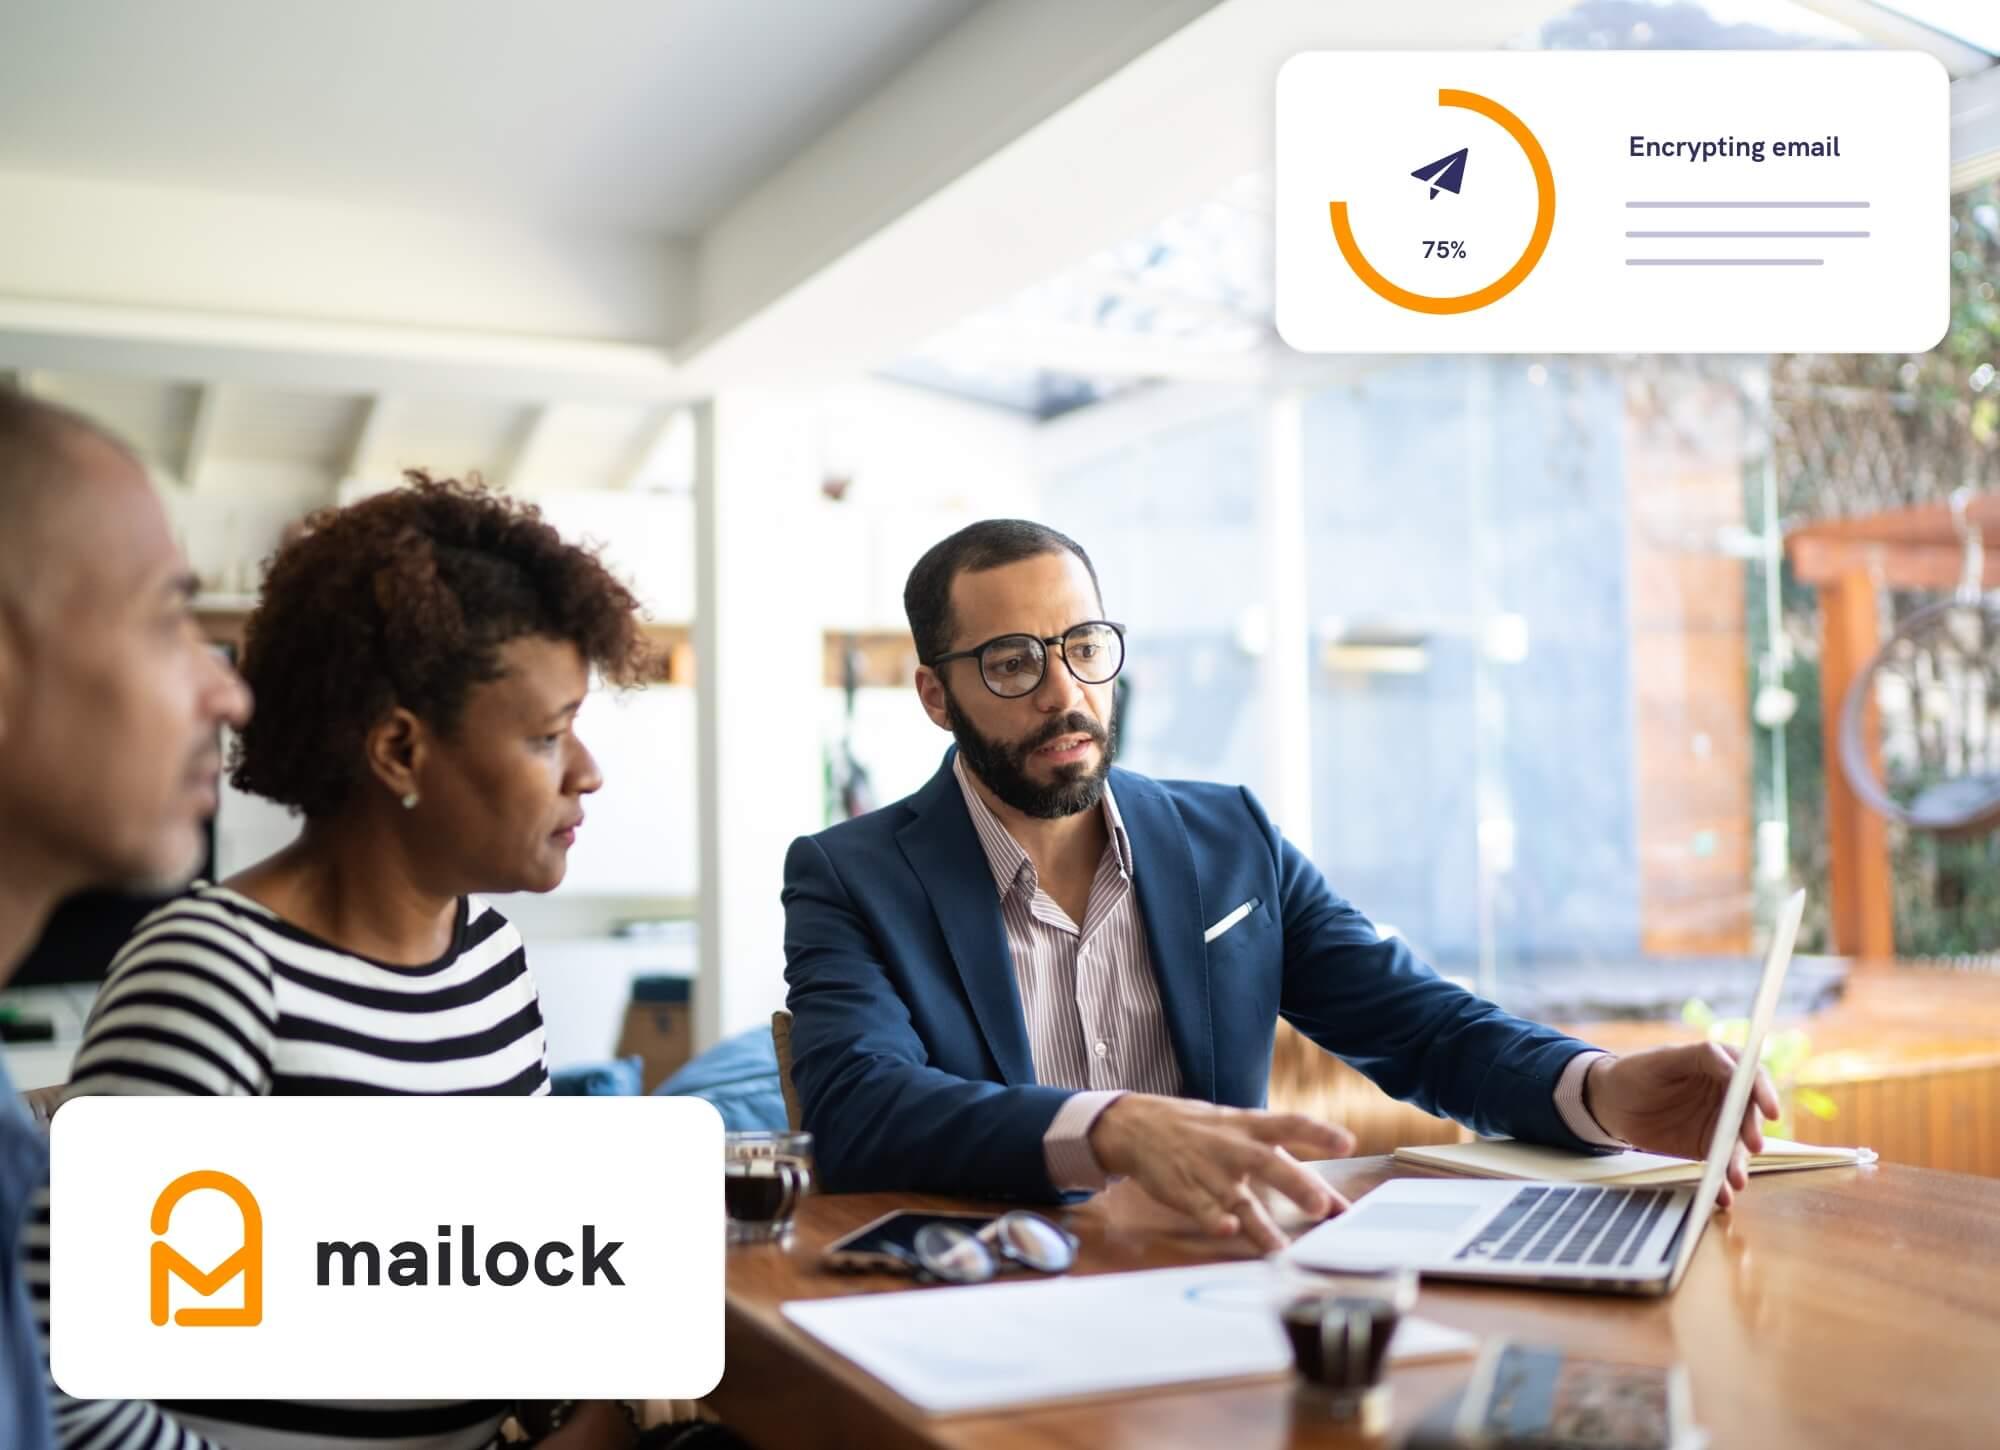 03_introducing_be_mailock